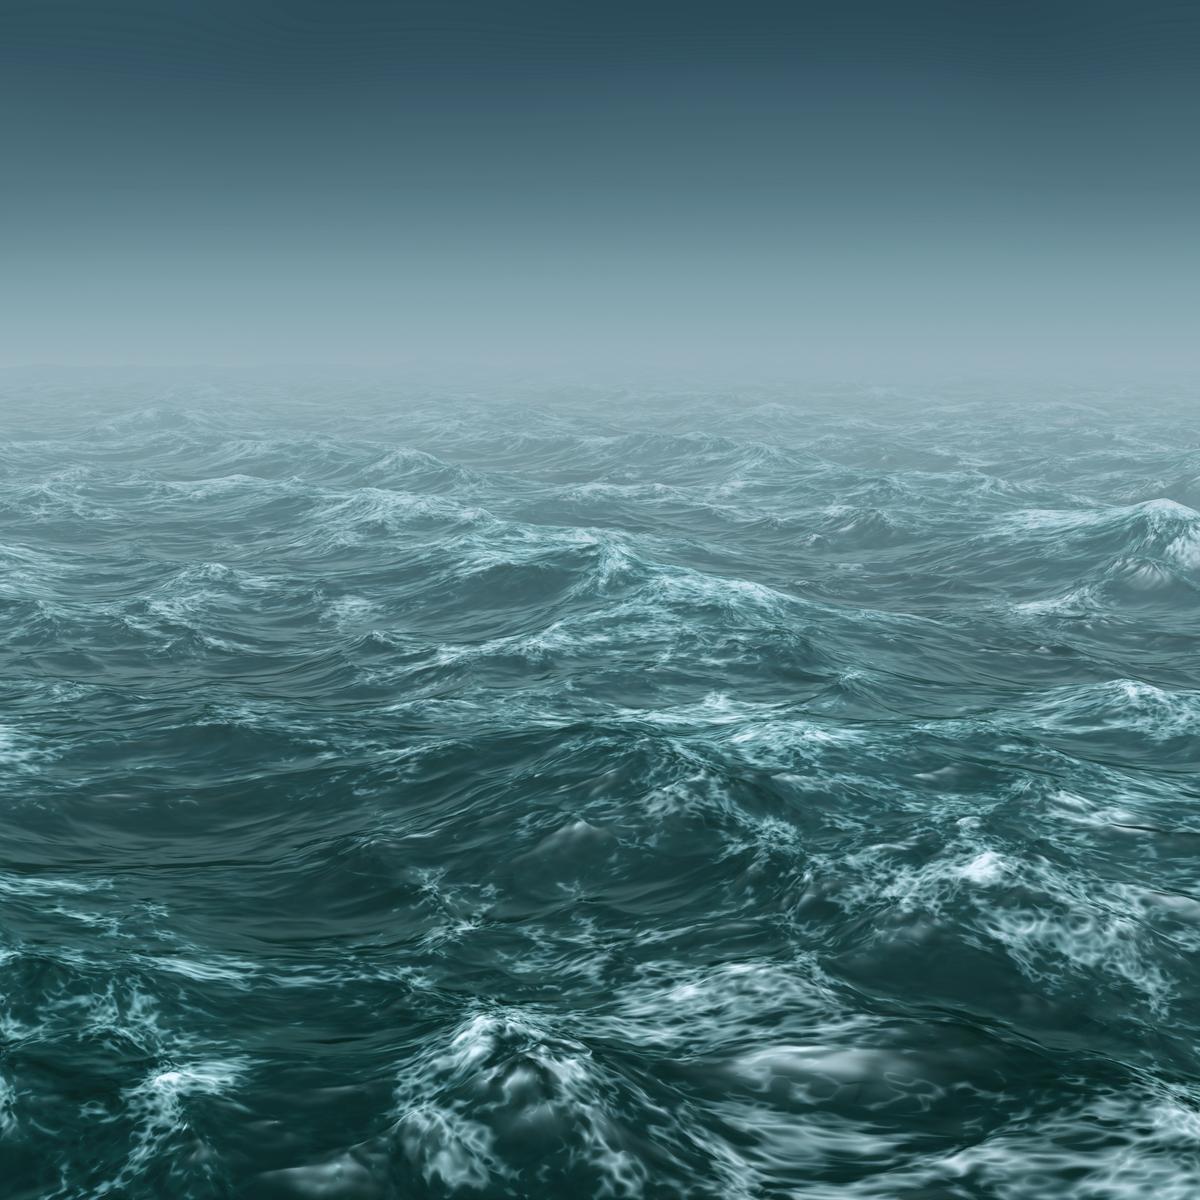 blog-andrea doria sinking-6-10-19